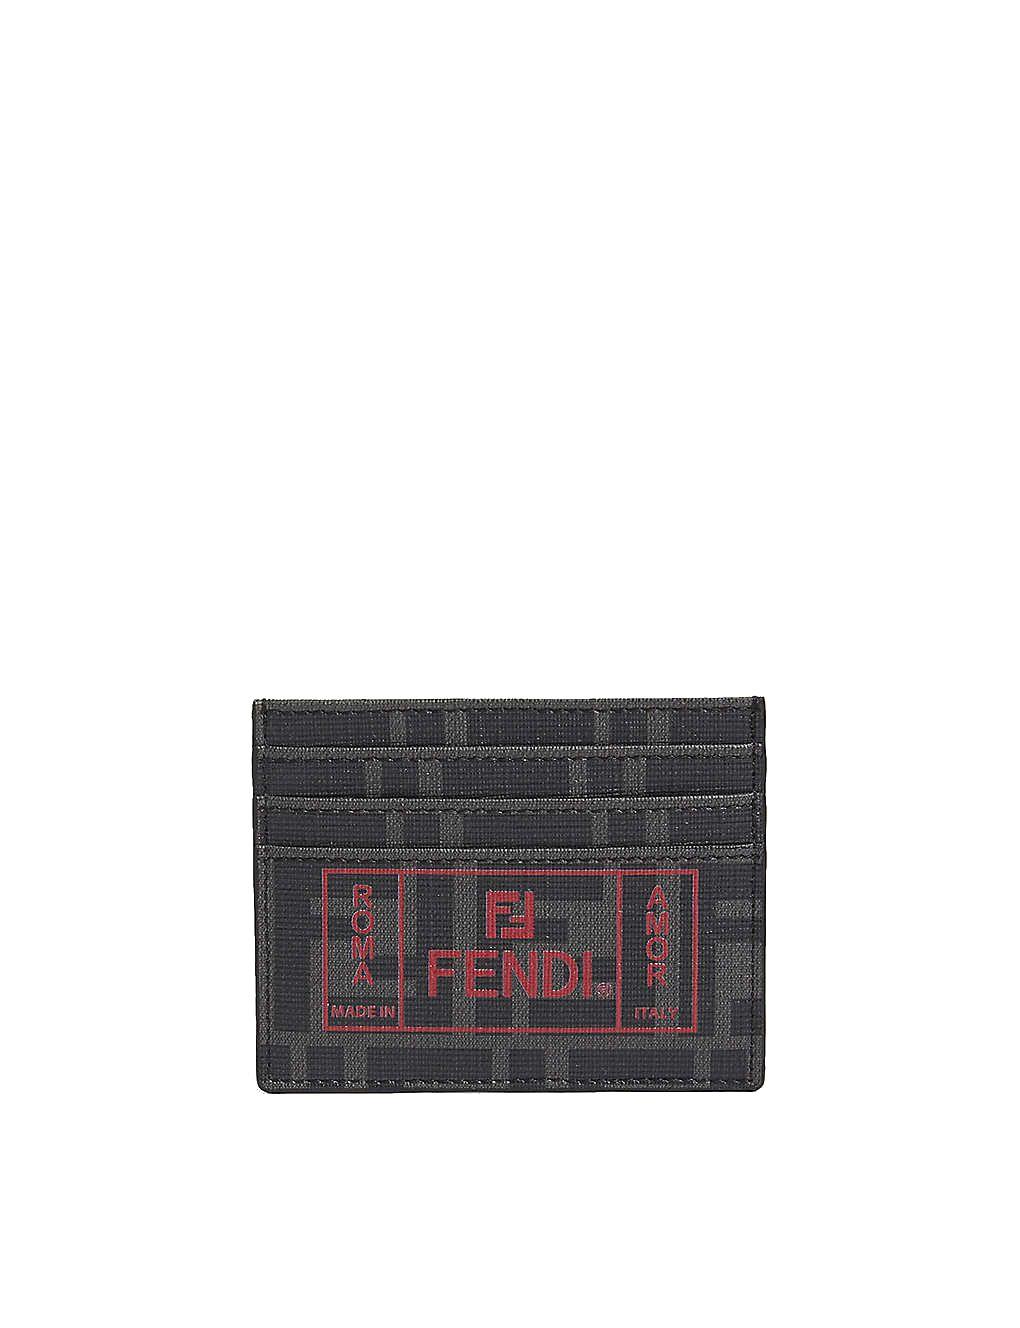 Fendi Black Men's Ff Roma Amor Card Holder In Nero+Rosso